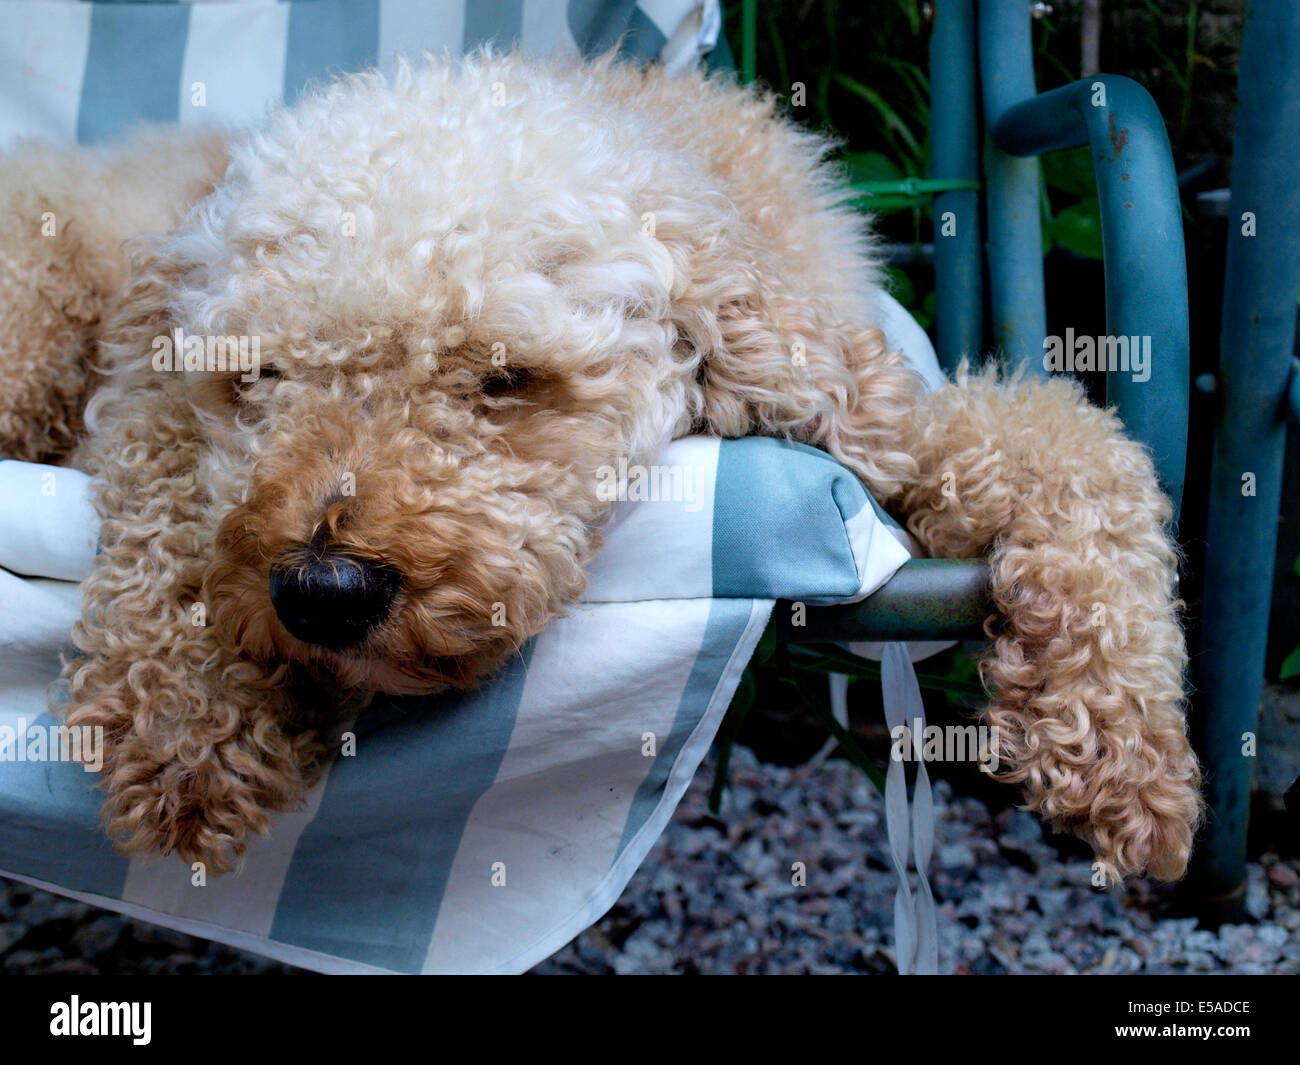 Labradoodle dog asleep on a garden swing seat, UK - Stock Image